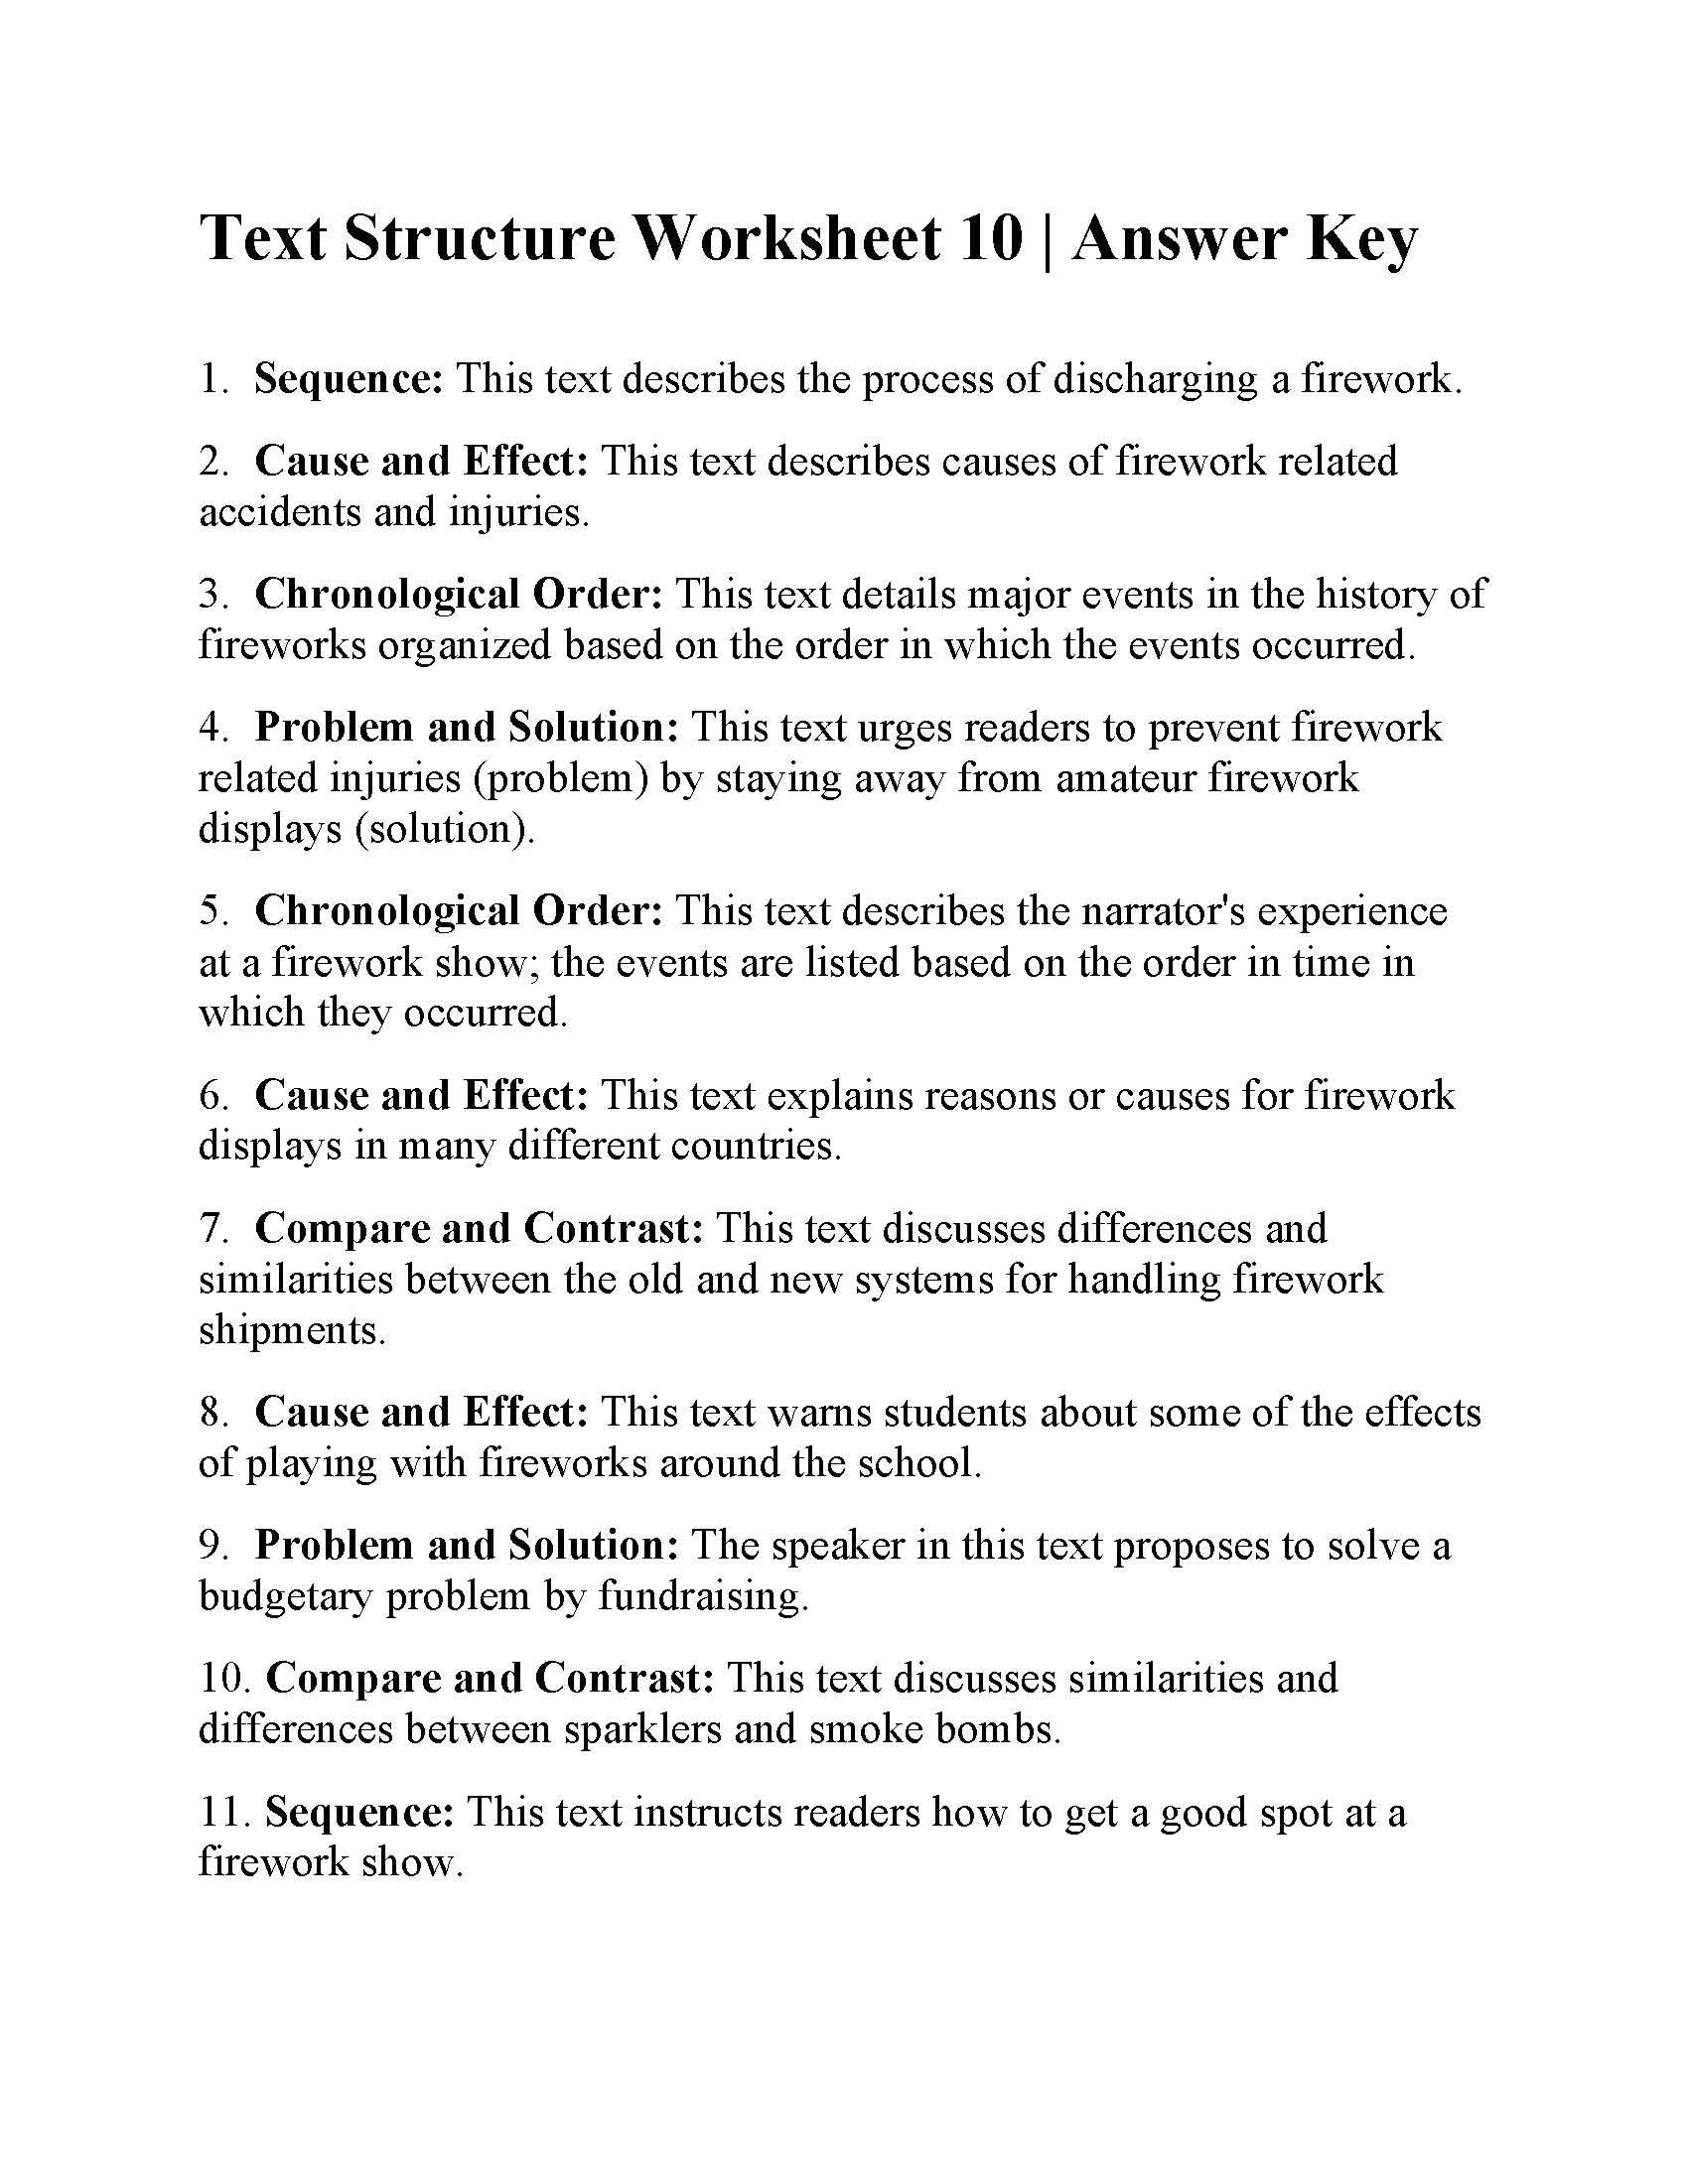 Text Structure Worksheets 3rd Grade Worksheet Grade 10